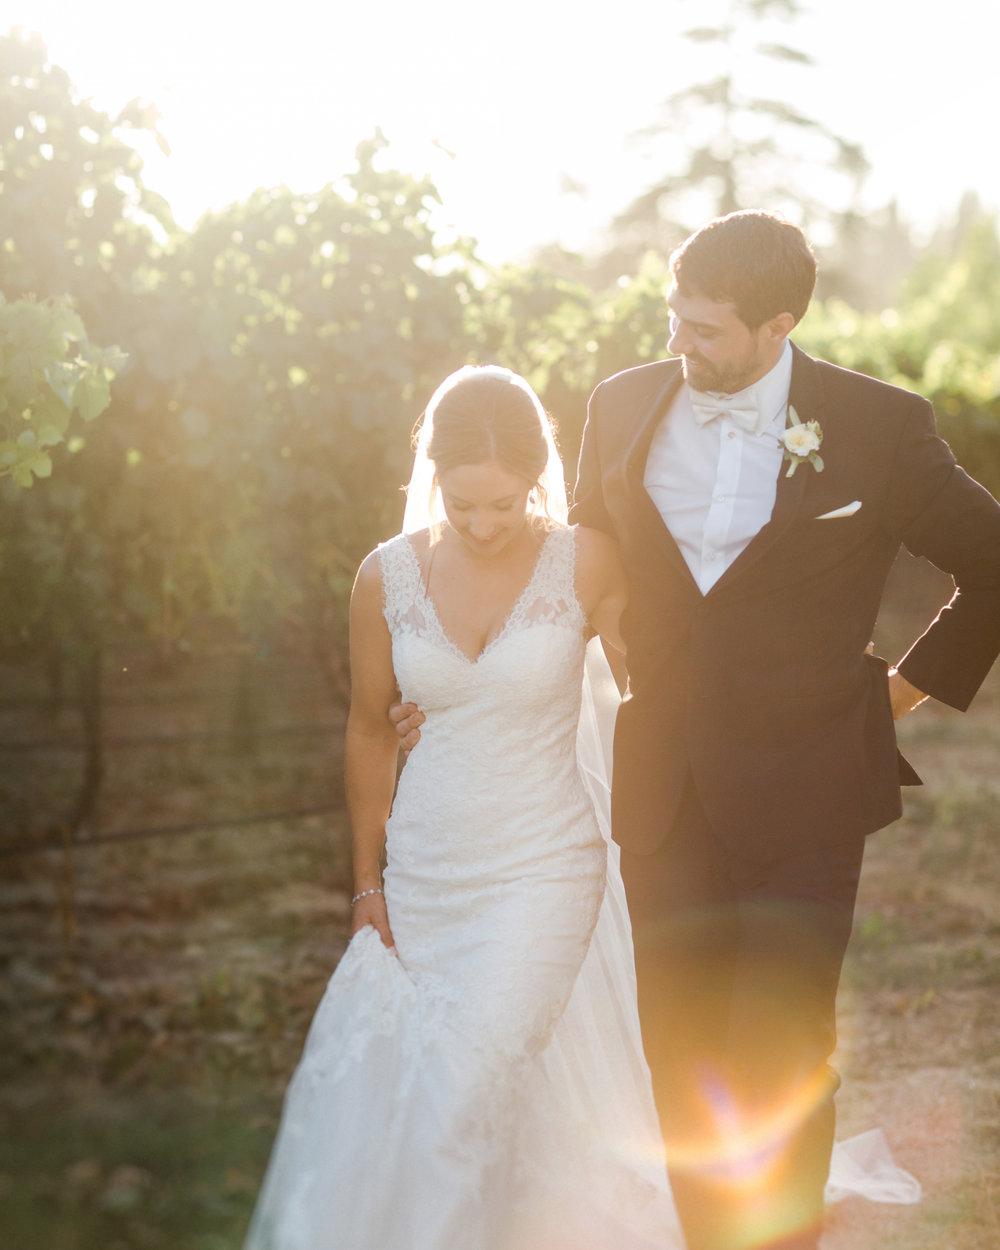 069_Vine_Hill_House_Wedding_Photographer.JPG